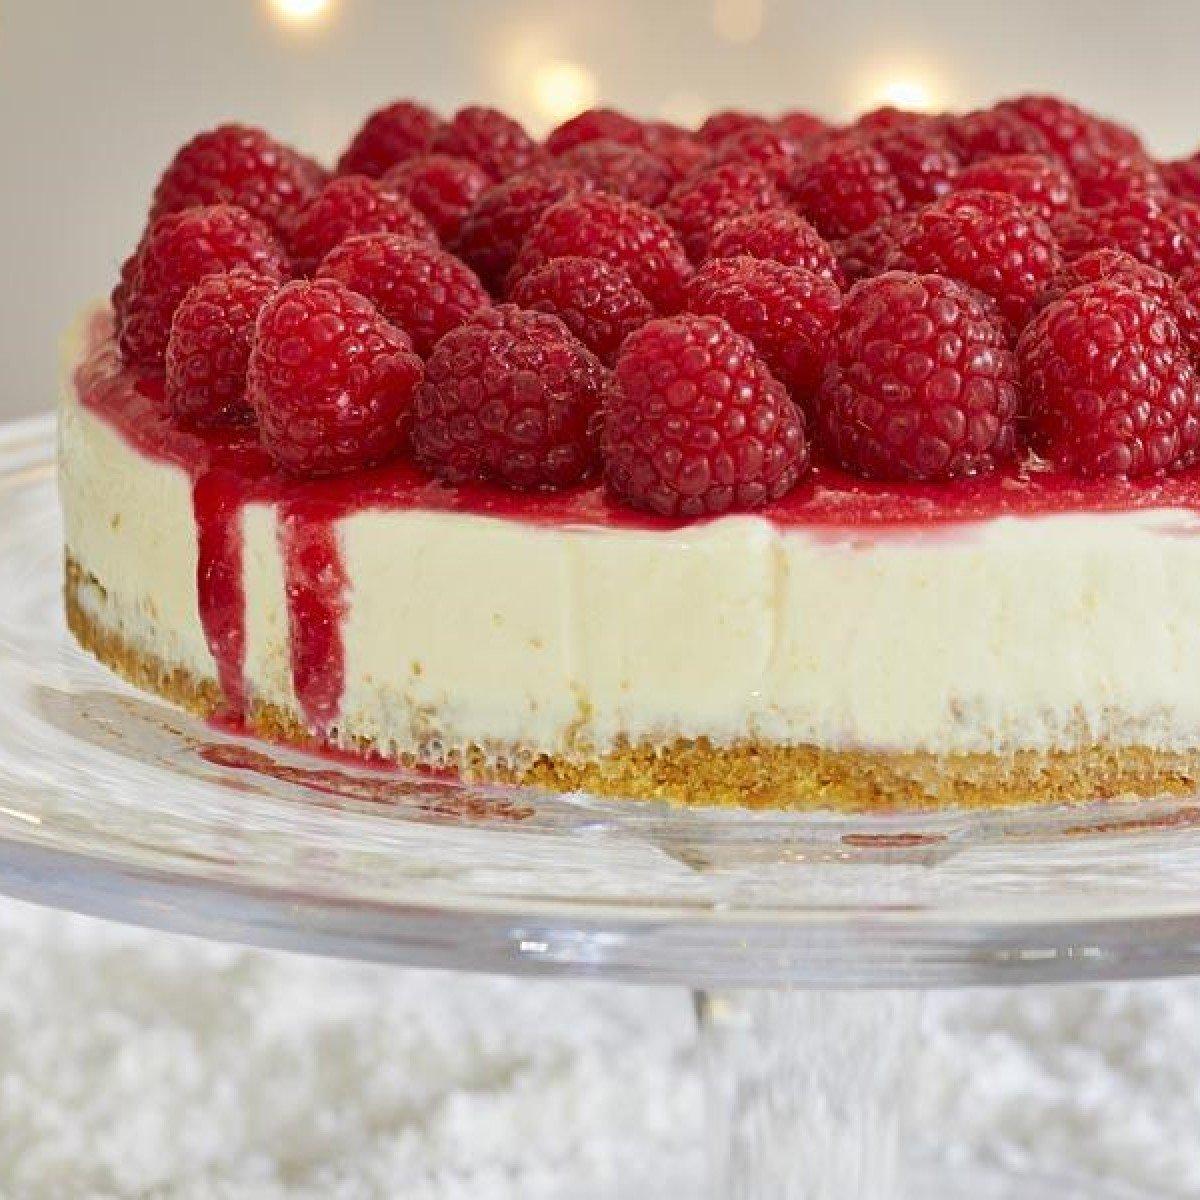 No-bake Philadelphia Cheesecake with Raspberries Recipe